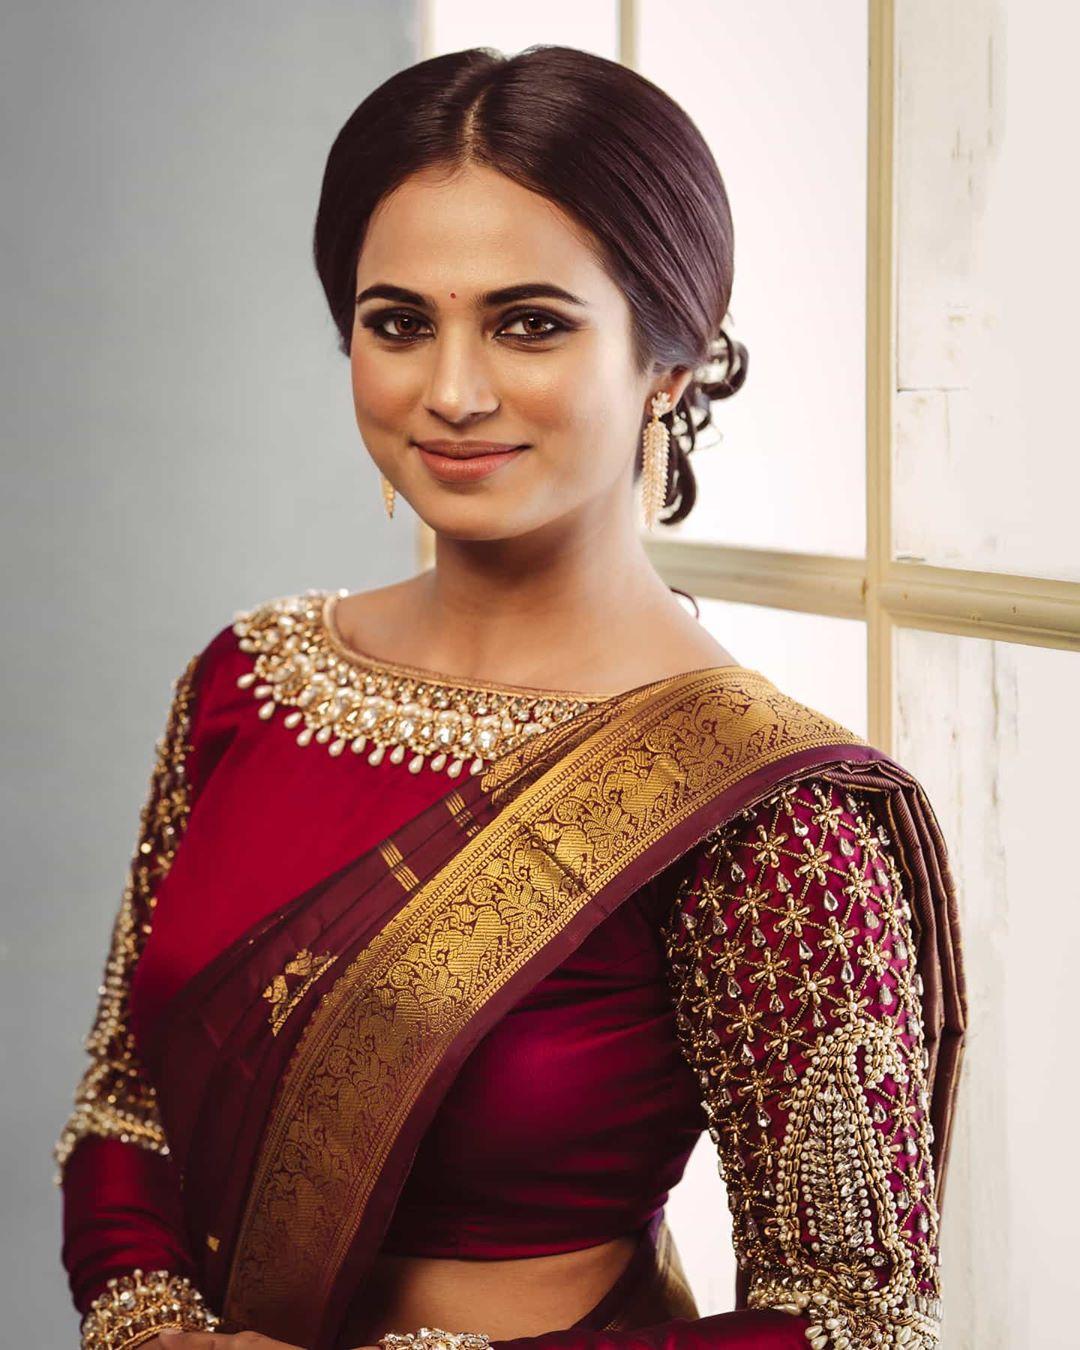 Actress Ramya pandian New exclusive pics